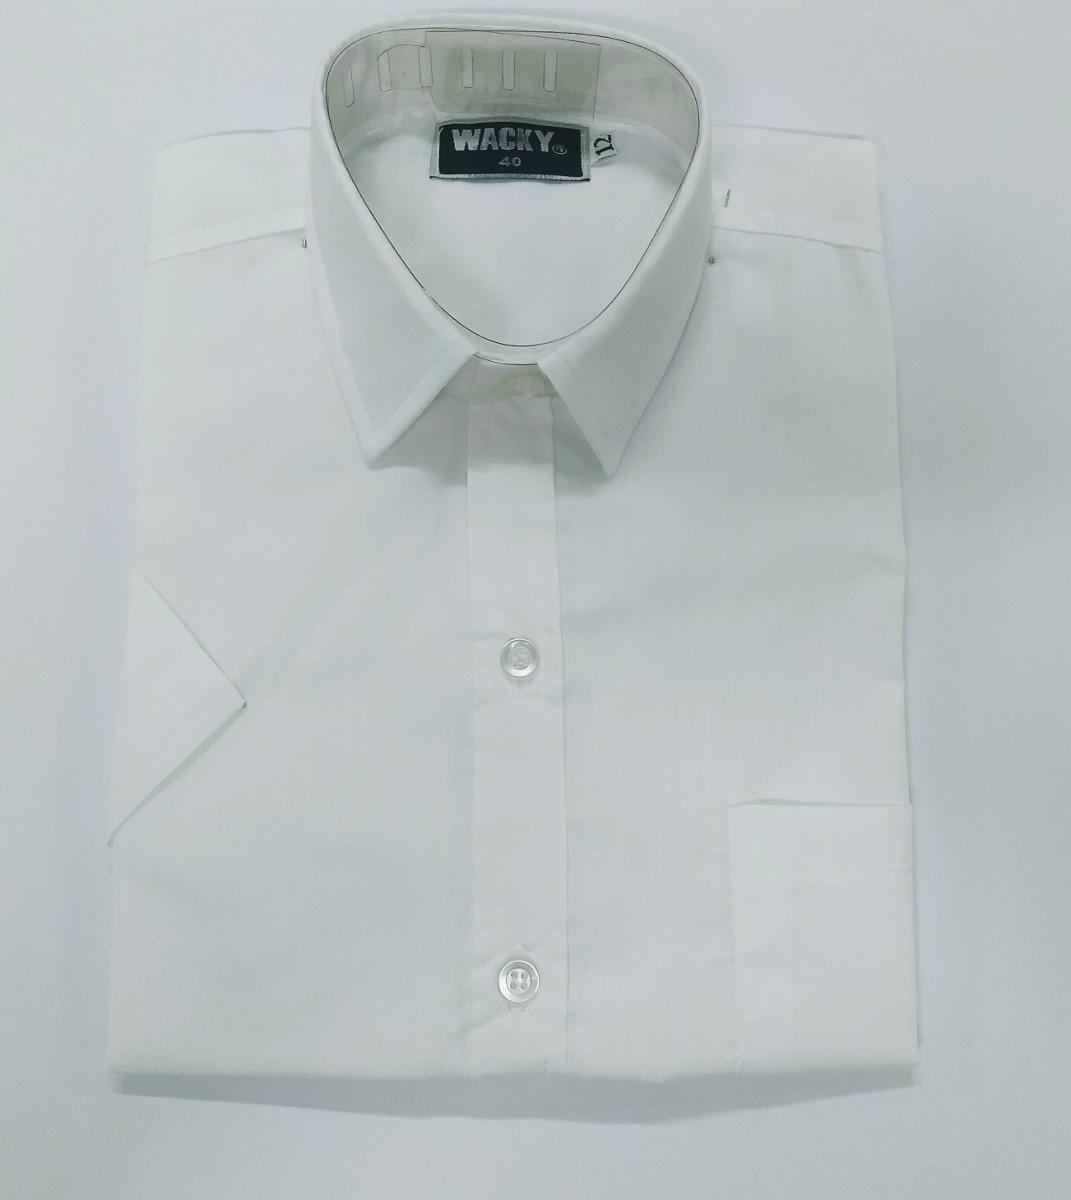 c289956d8 camisa manga corta blanca colegial talle 6 al 16. Cargando zoom.